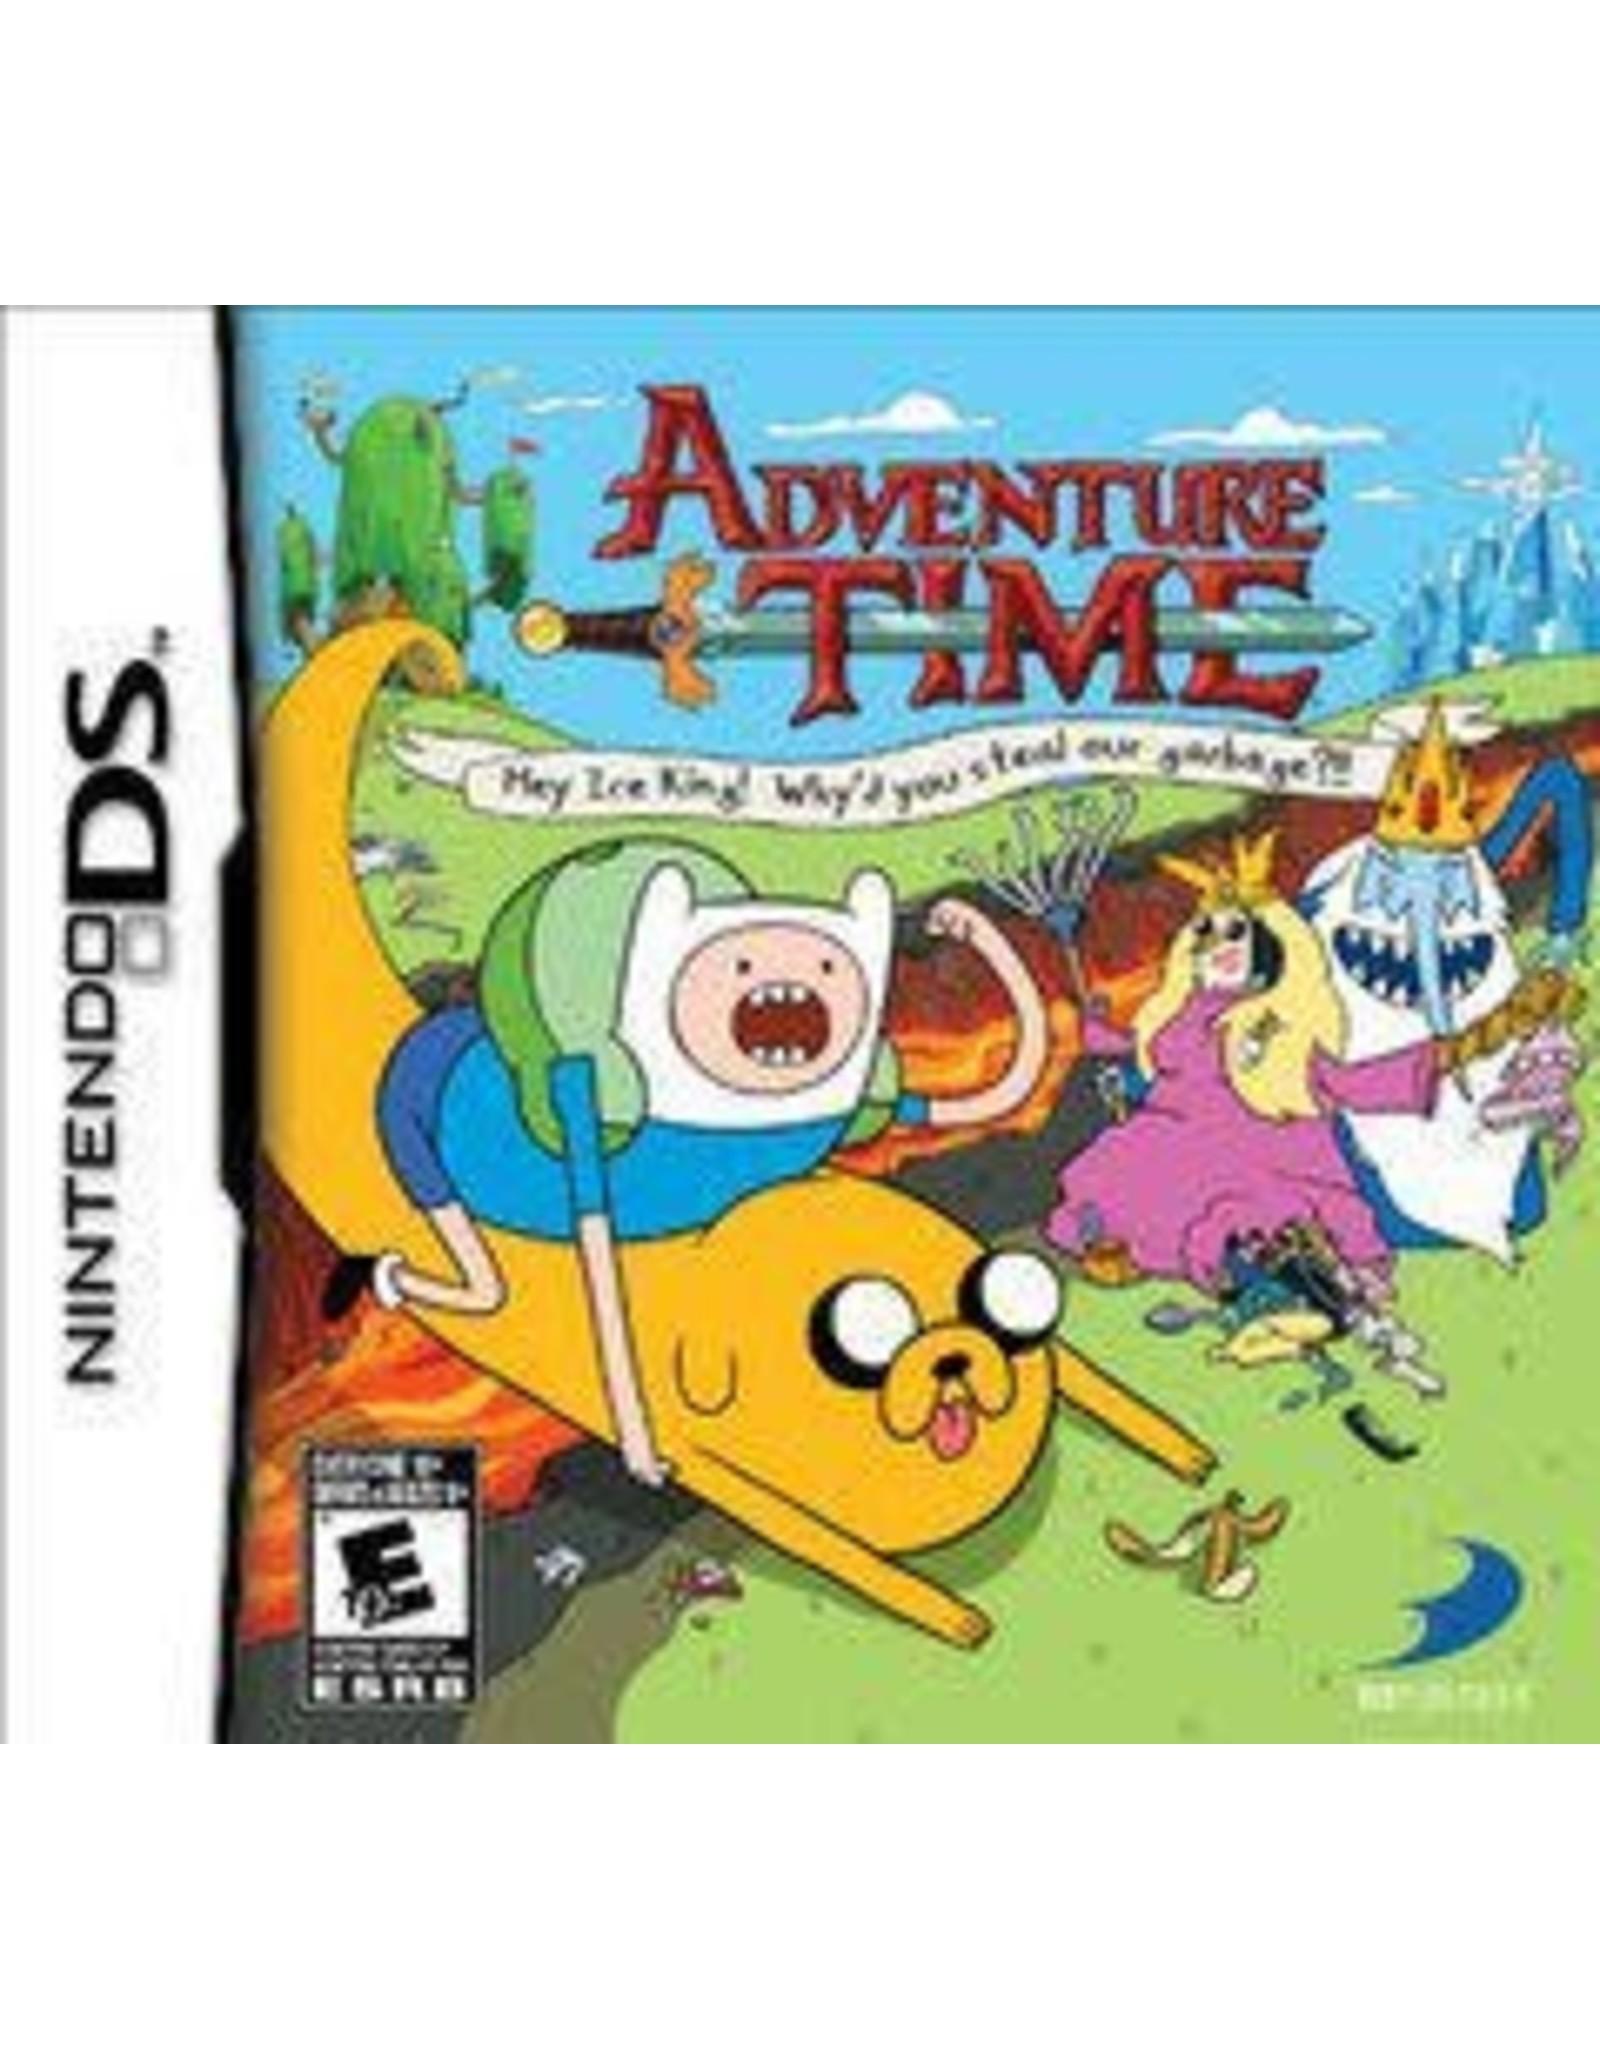 Nintendo DS Adventure Time: Hey Ice King (CIB)